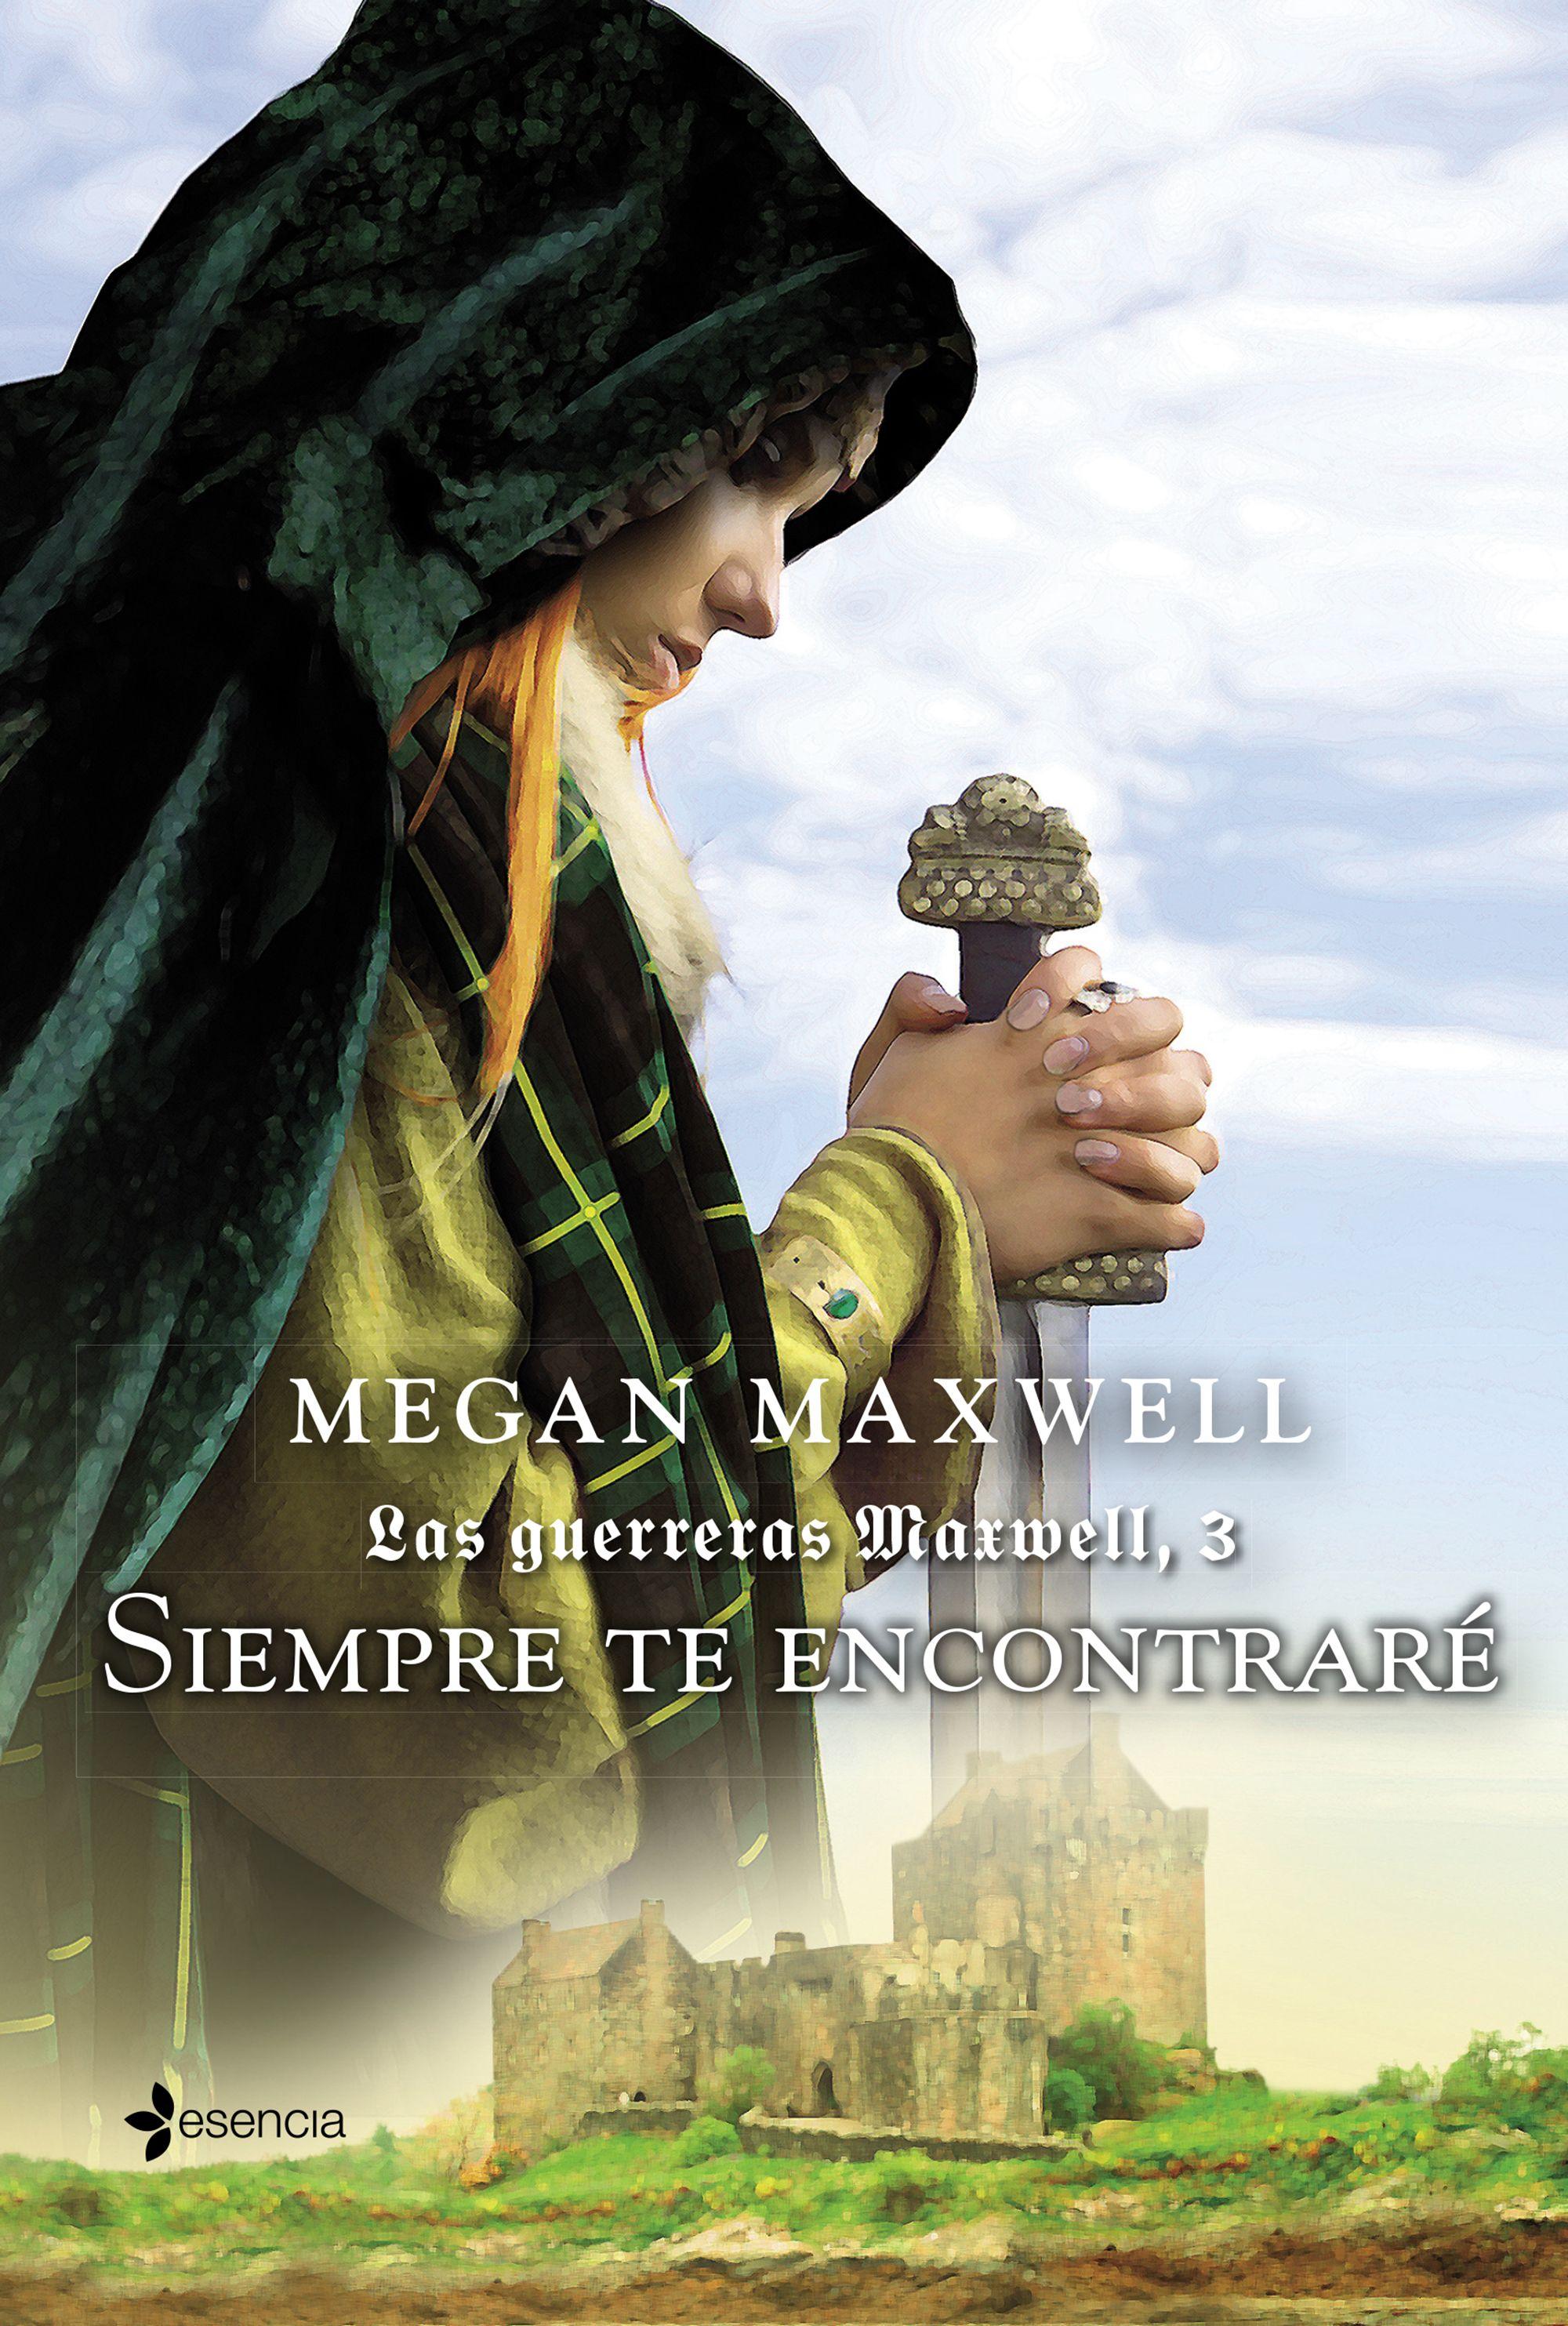 Siempre Te Encontraré Megan Maxwell Planeta De Libros Megan Maxwell Libros Libros Romanticos Libros